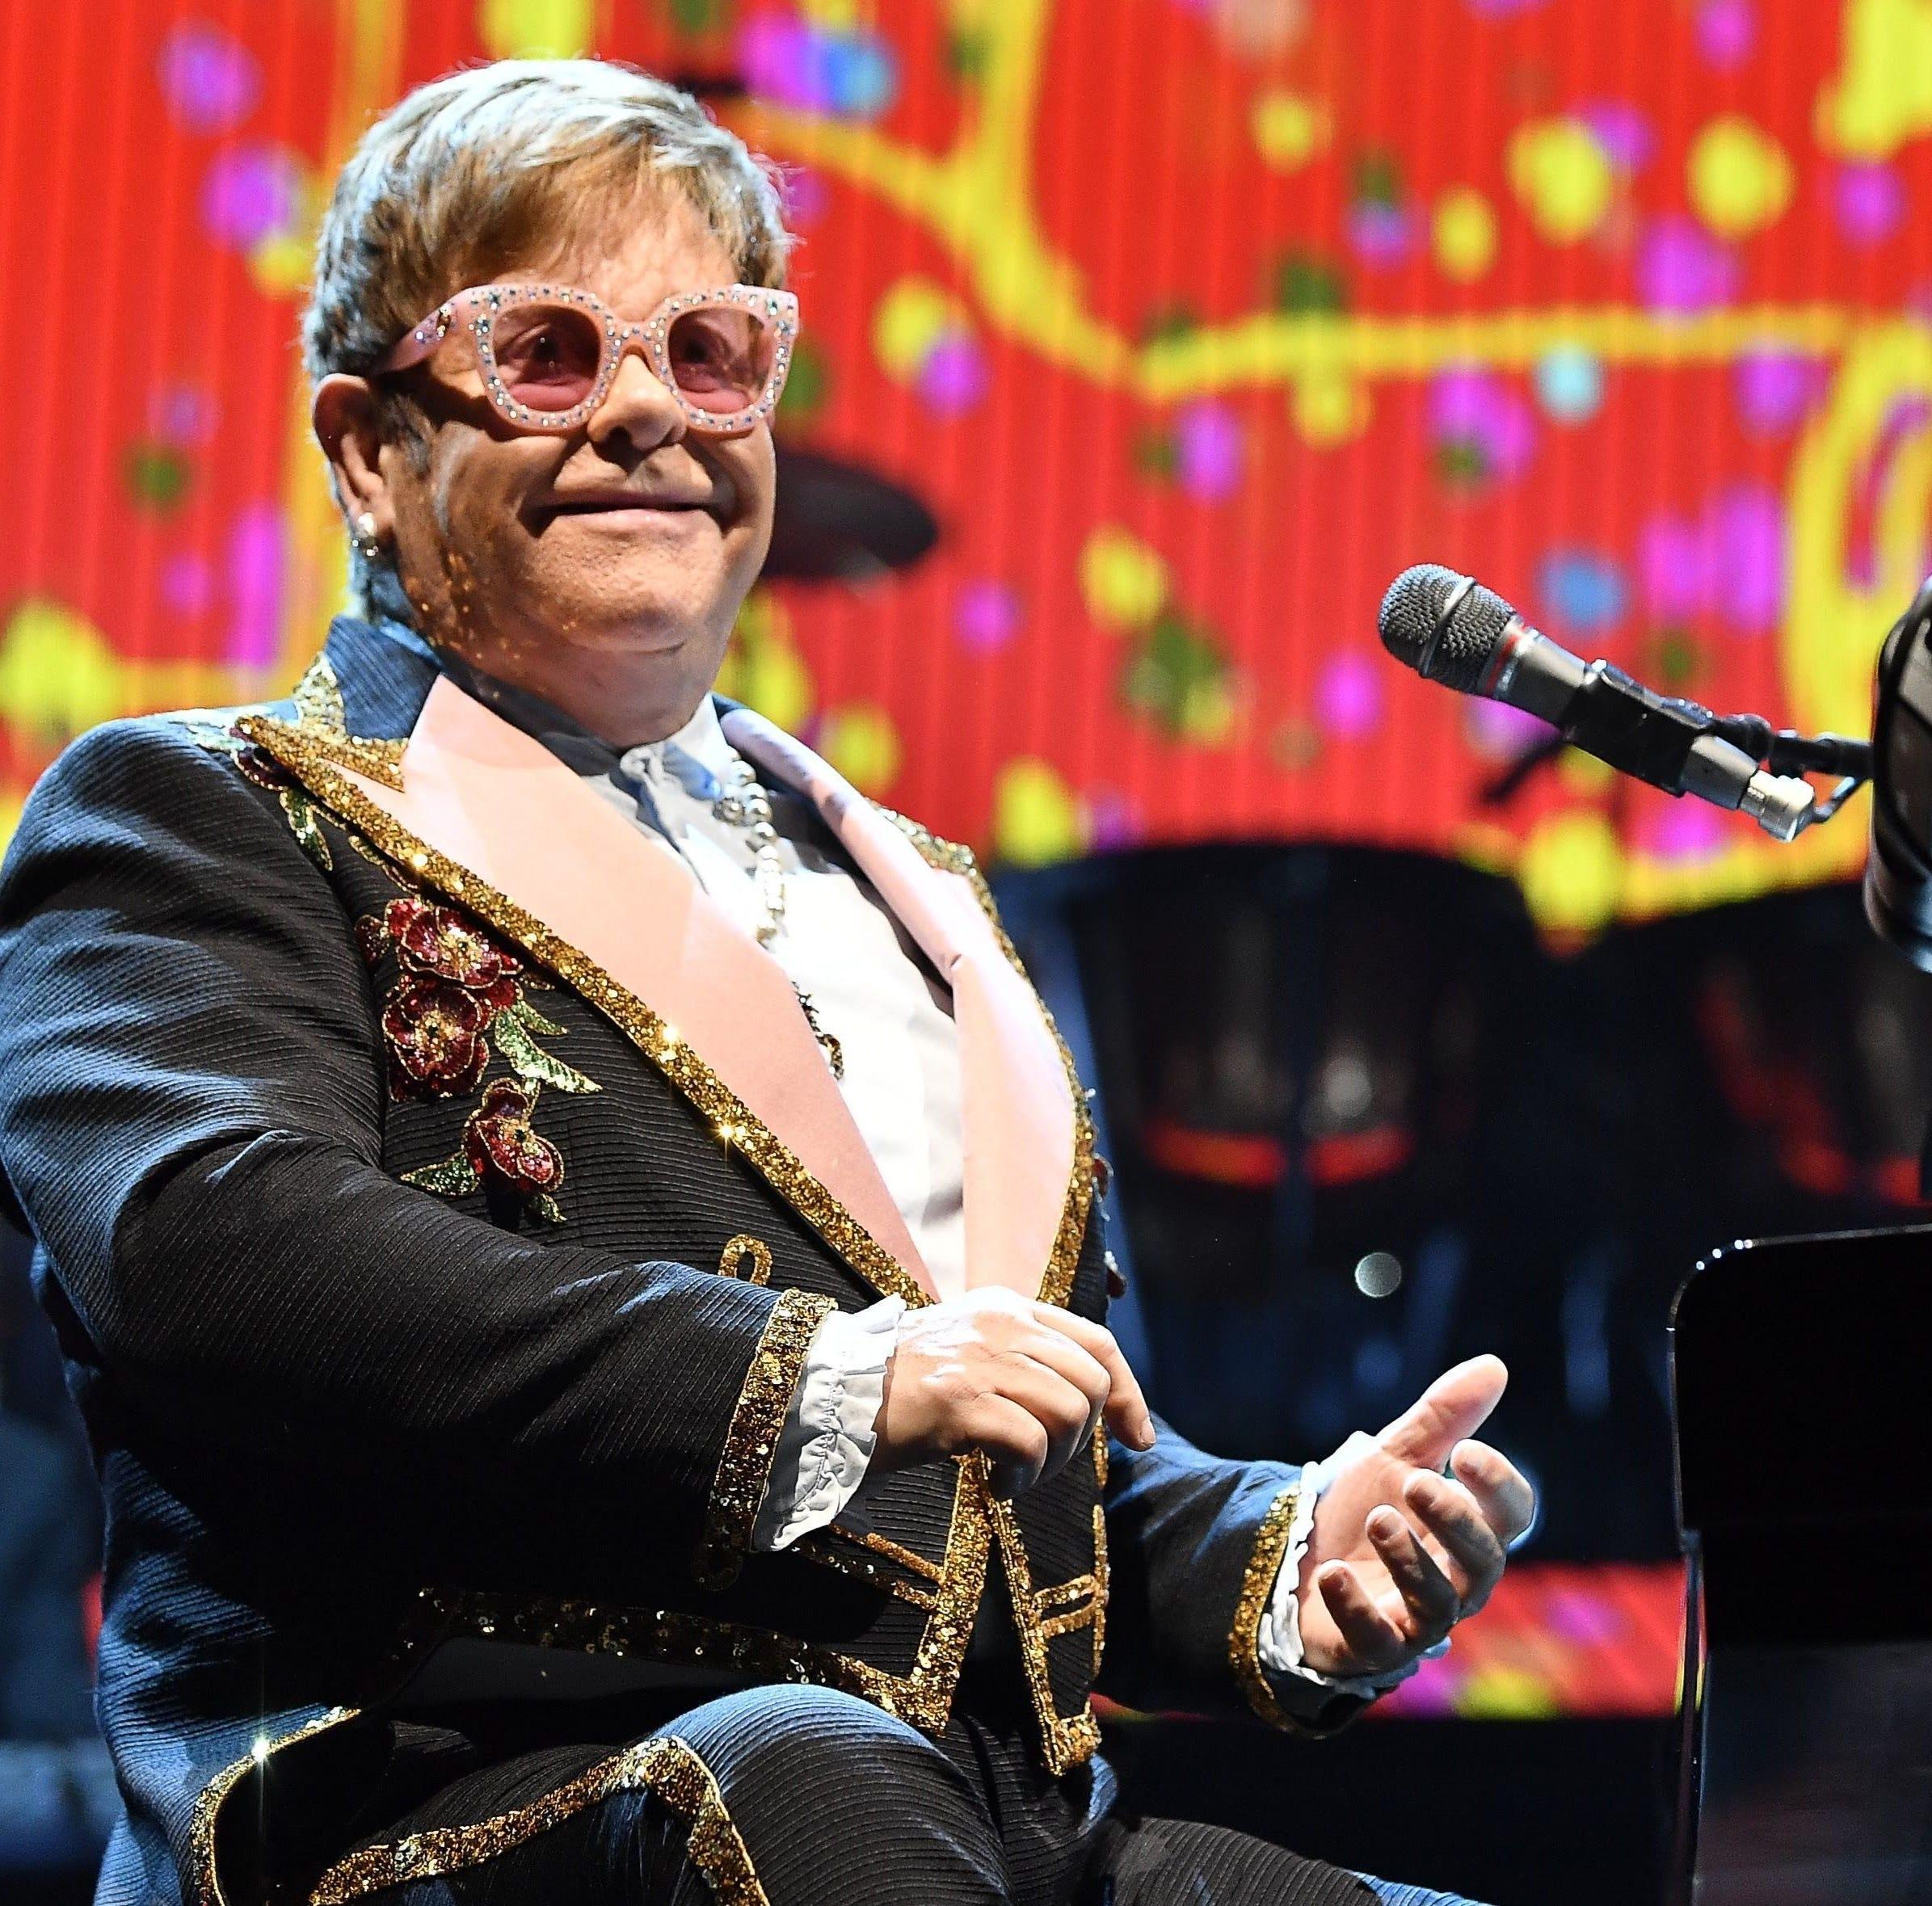 Elton John makeup concert in Orlando is this month — Hot Ticket